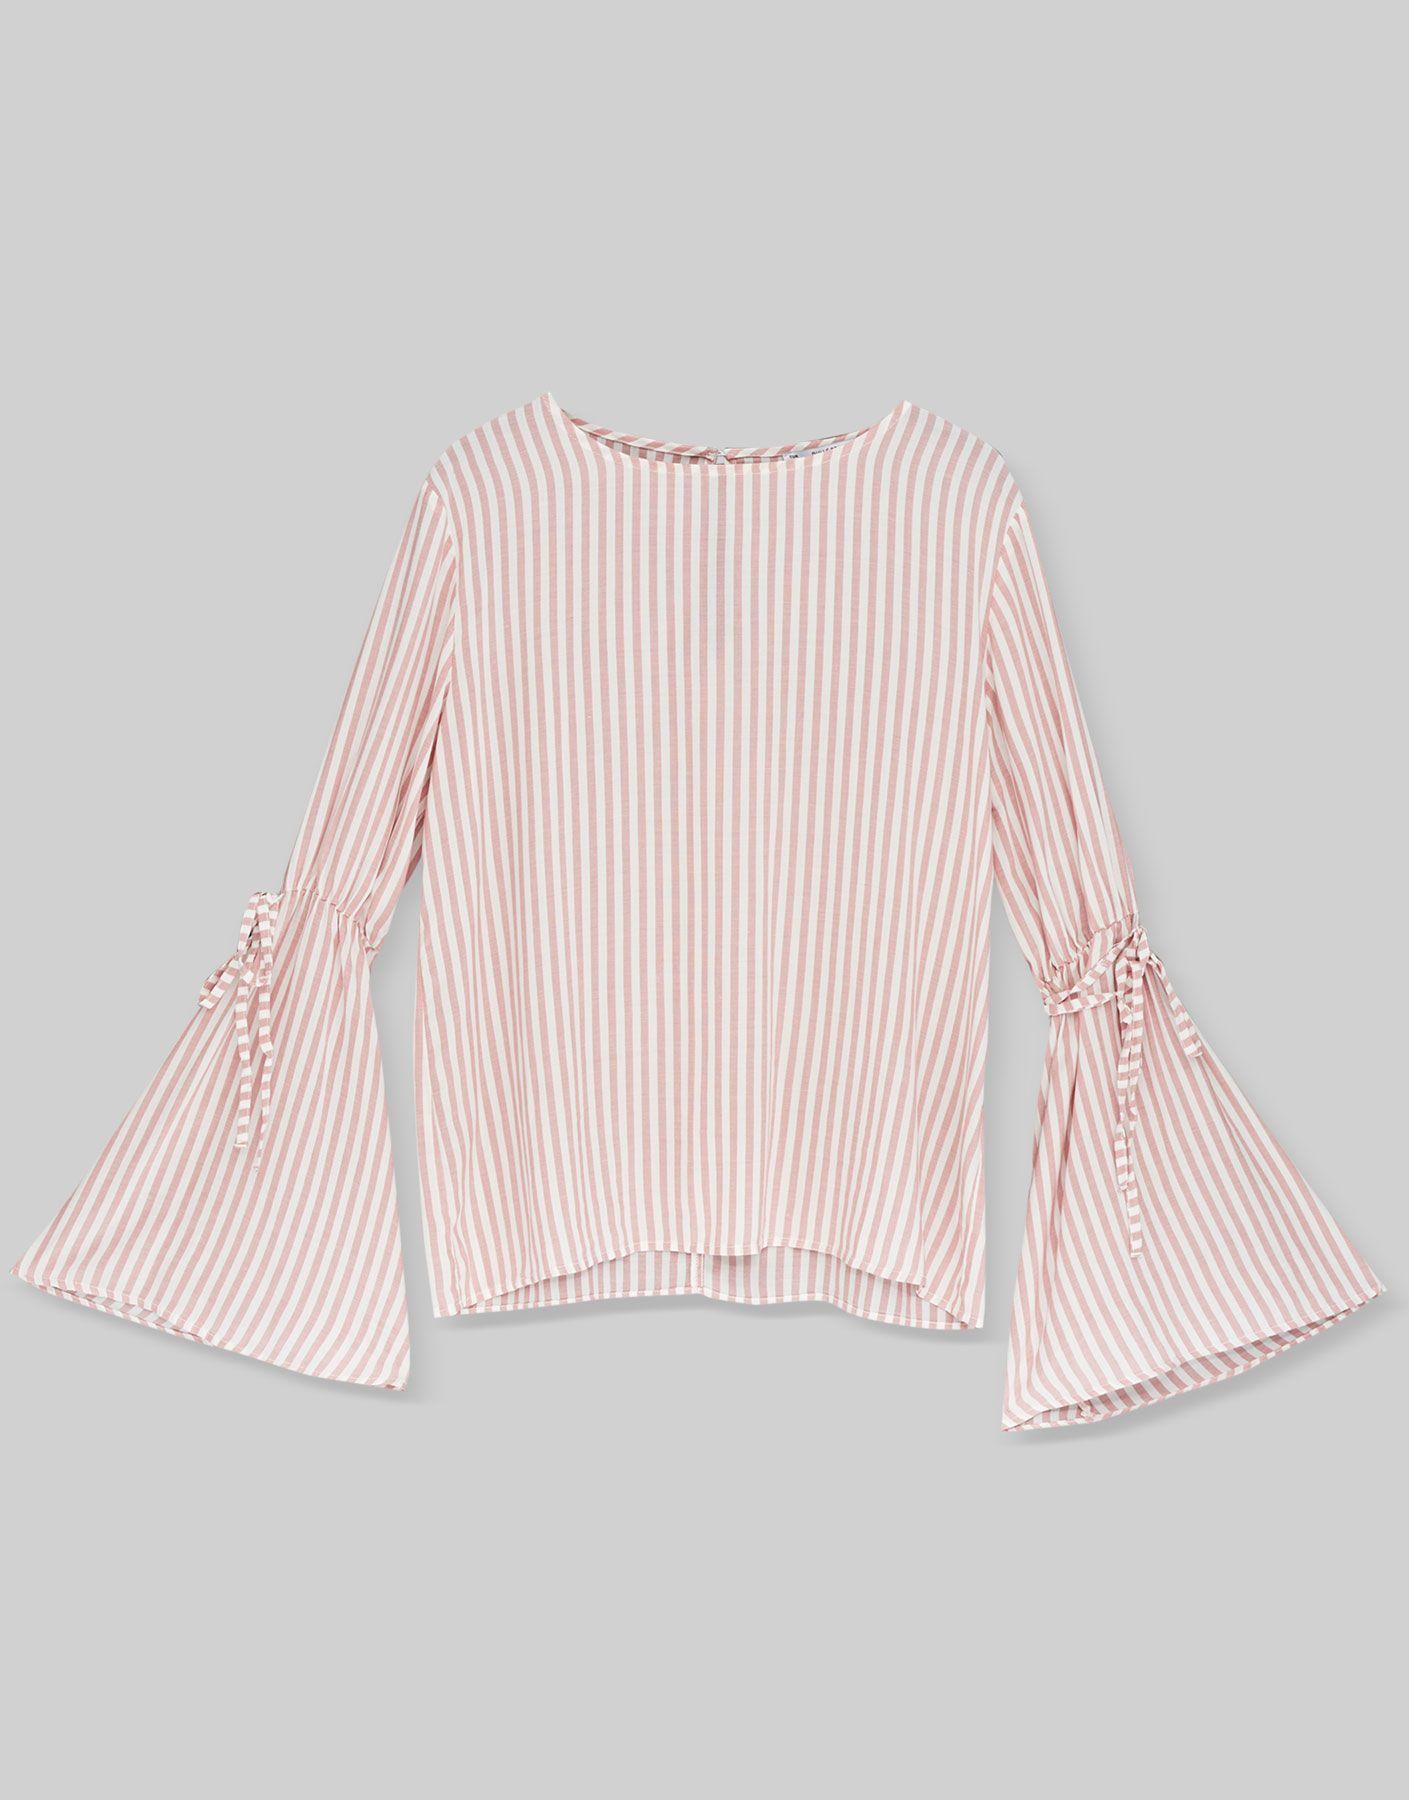 8c3312e3b69ed Camisa manga campana - Blusas y camisas - Ropa - Mujer - PULL BEAR México